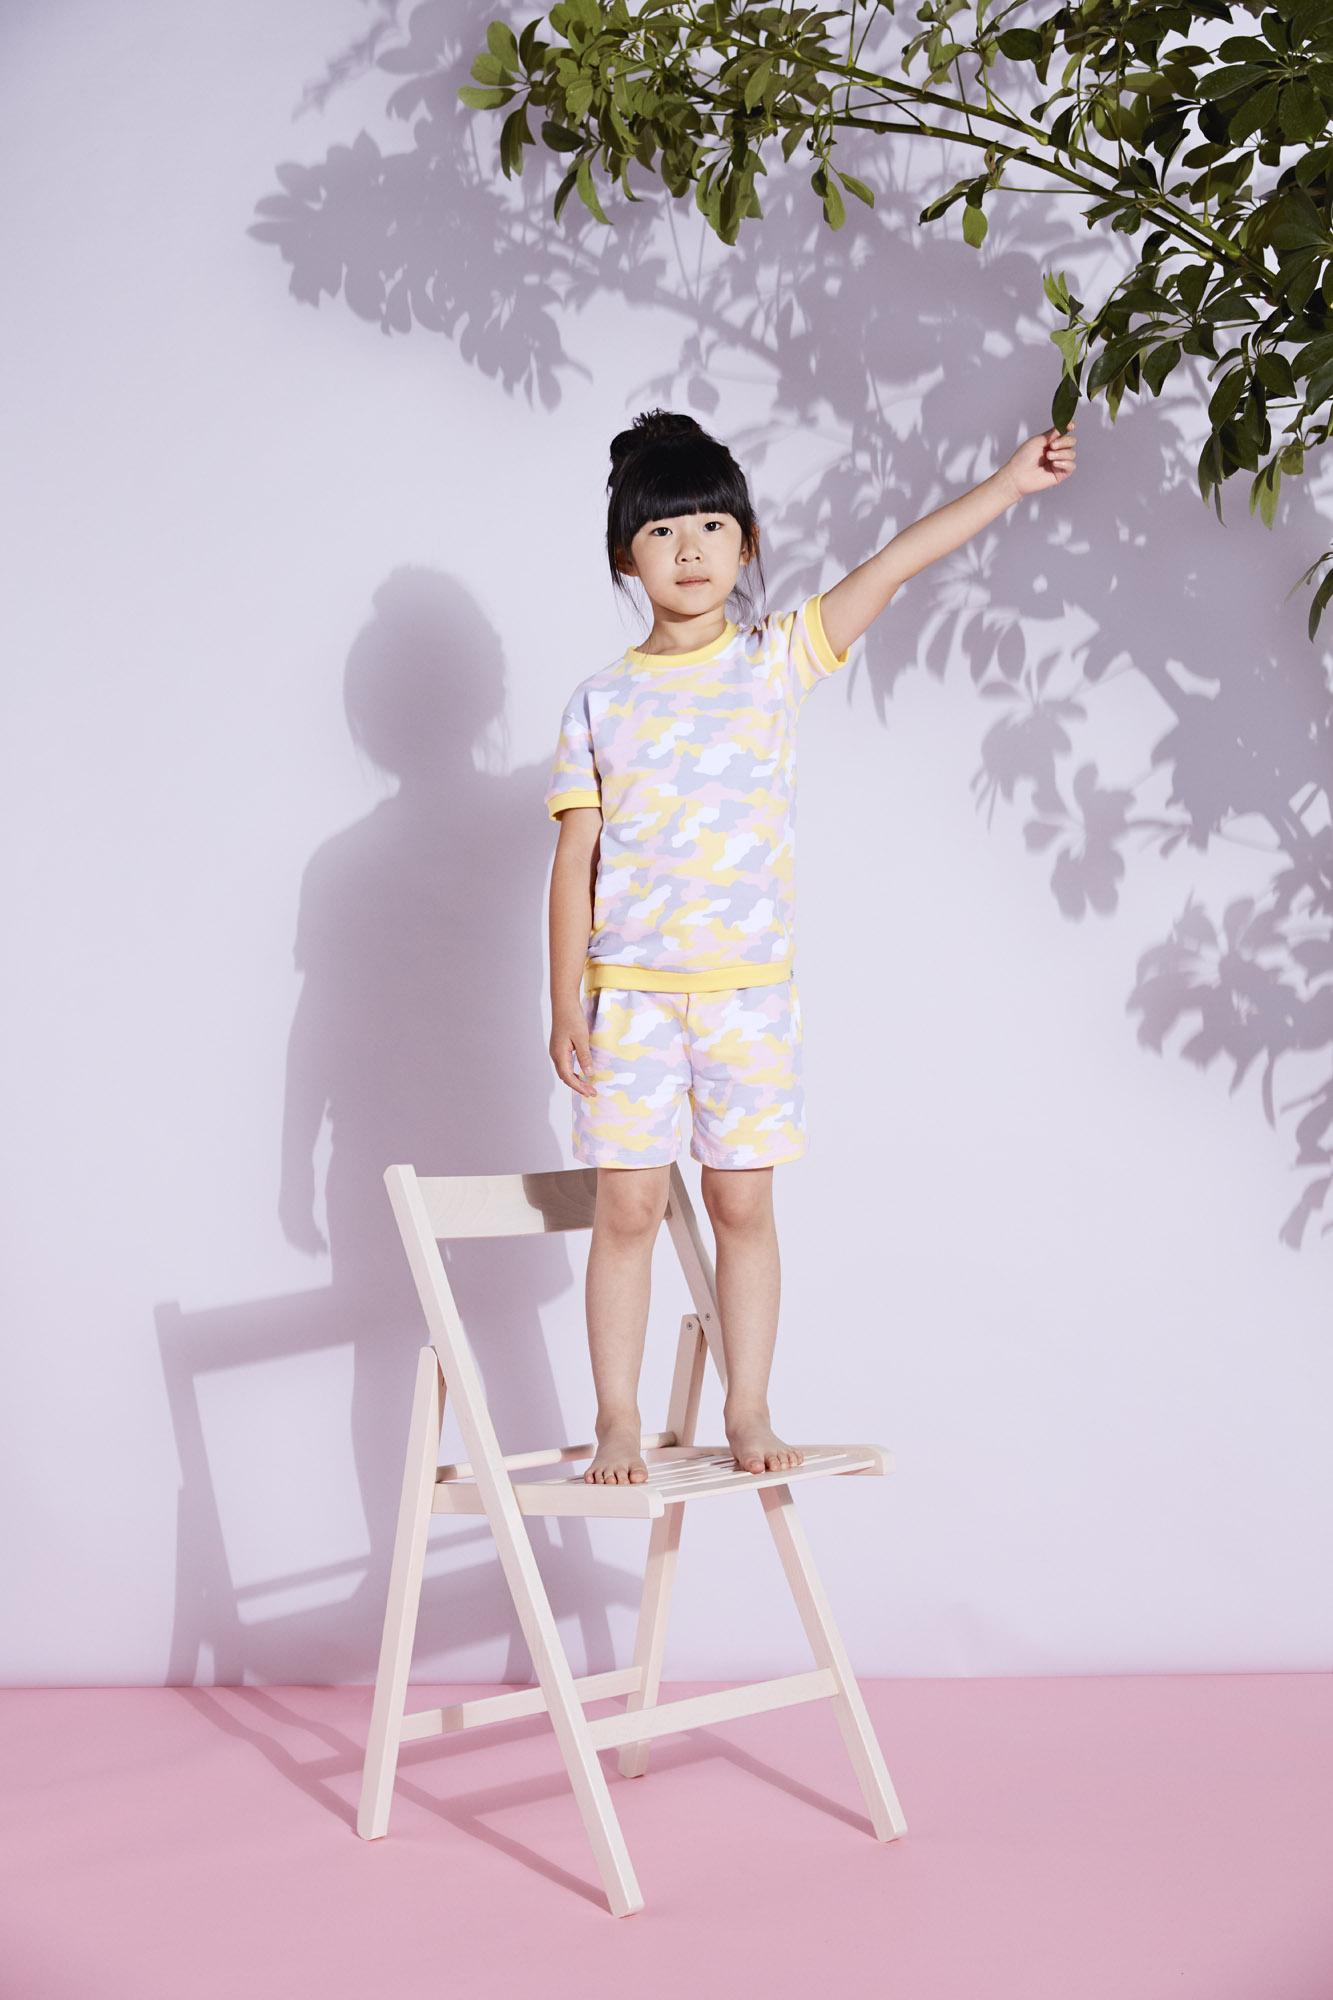 small stories kids organic clothing